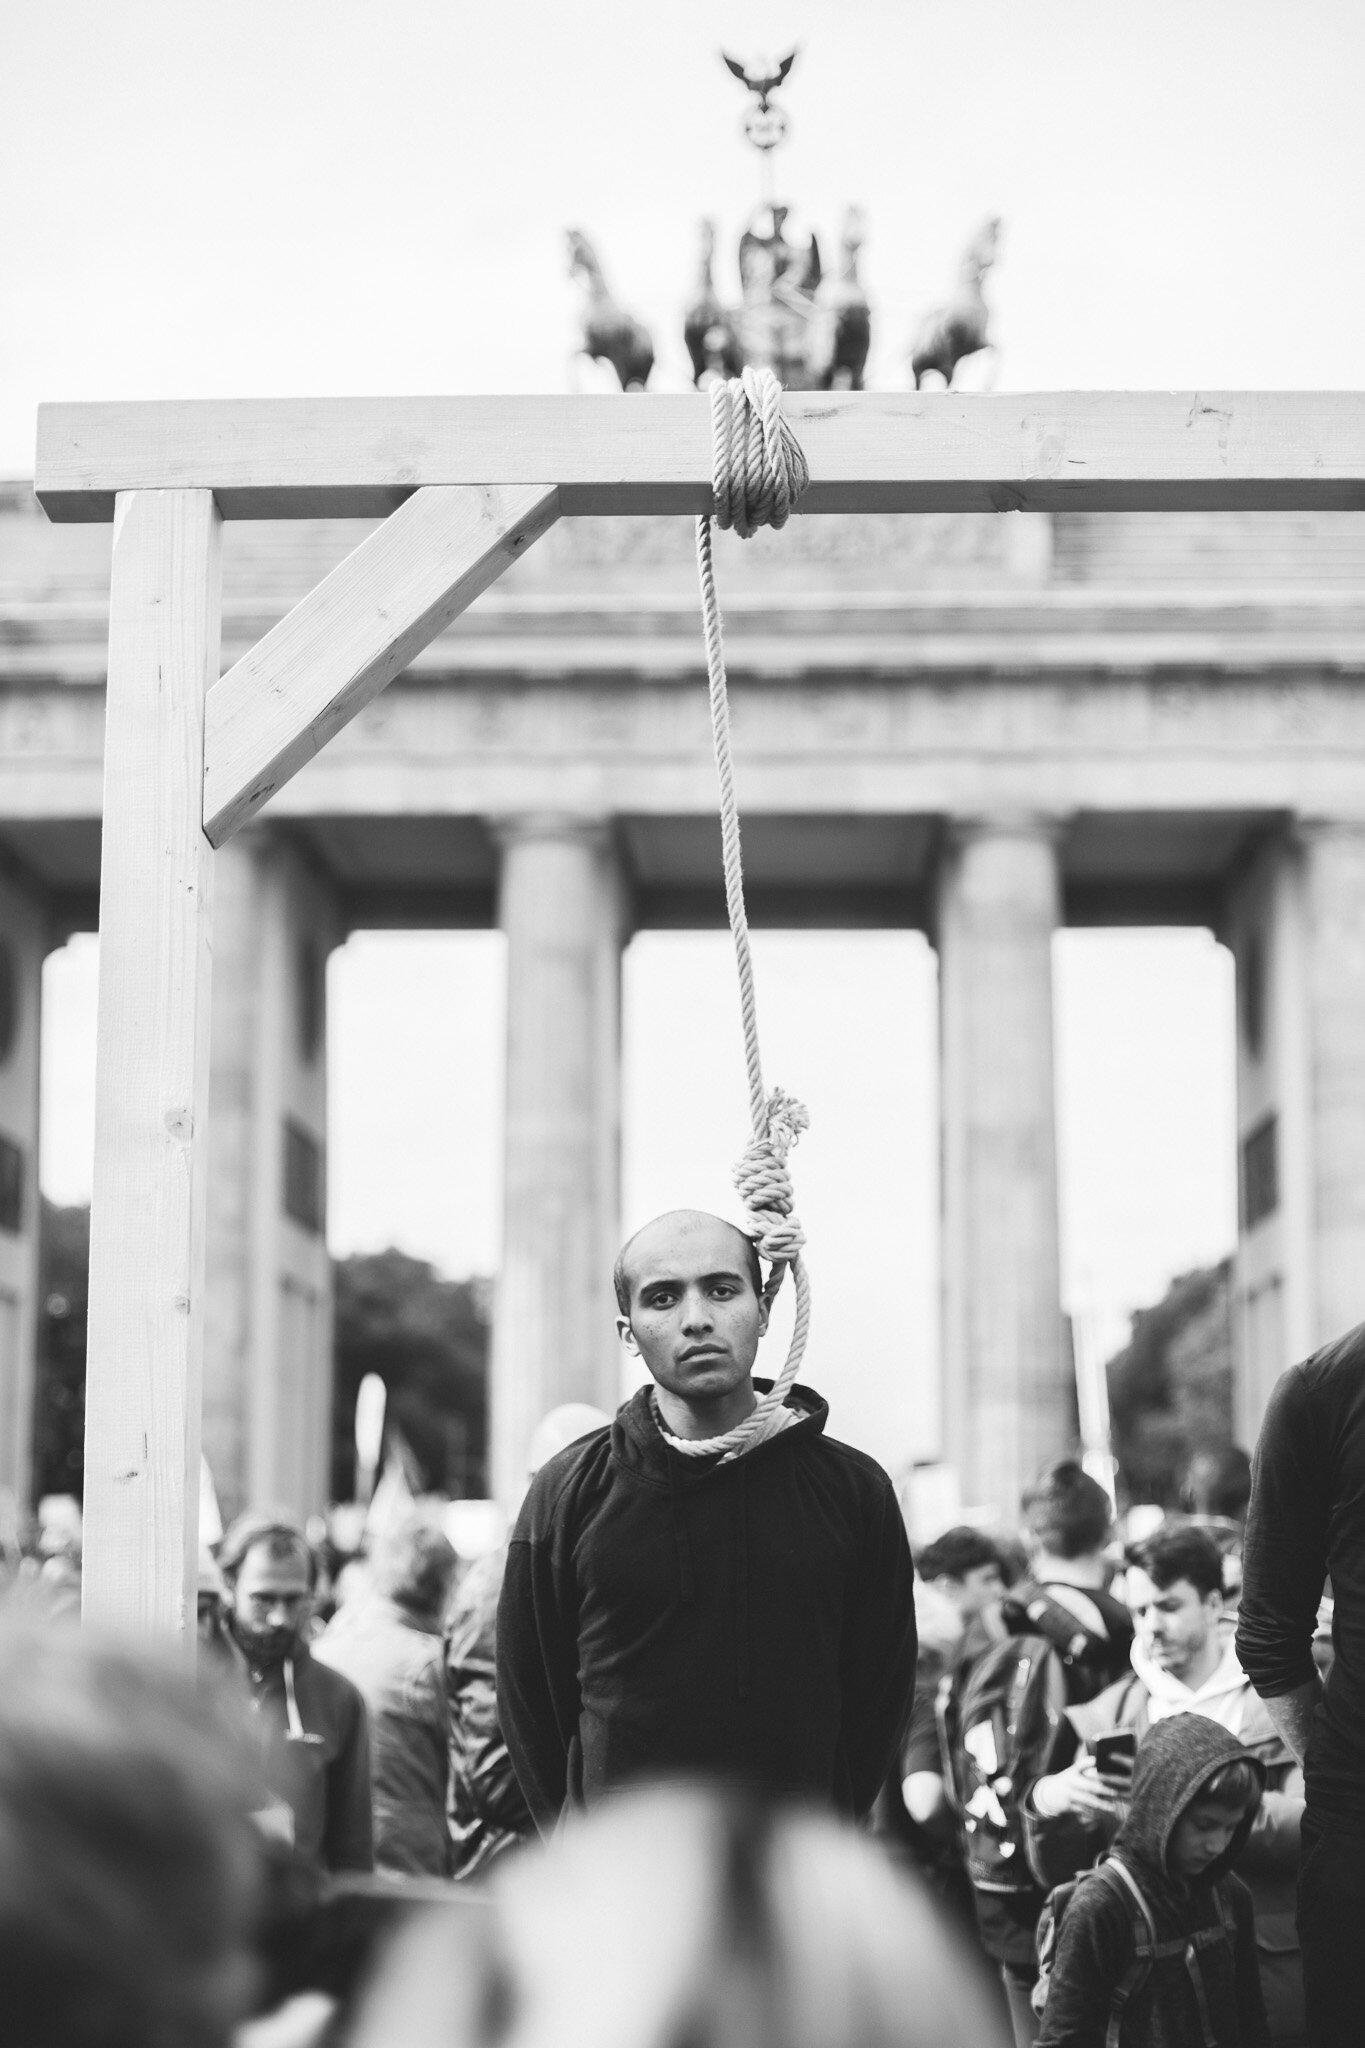 190920-Berlin-ClimateProtest-6424.jpg